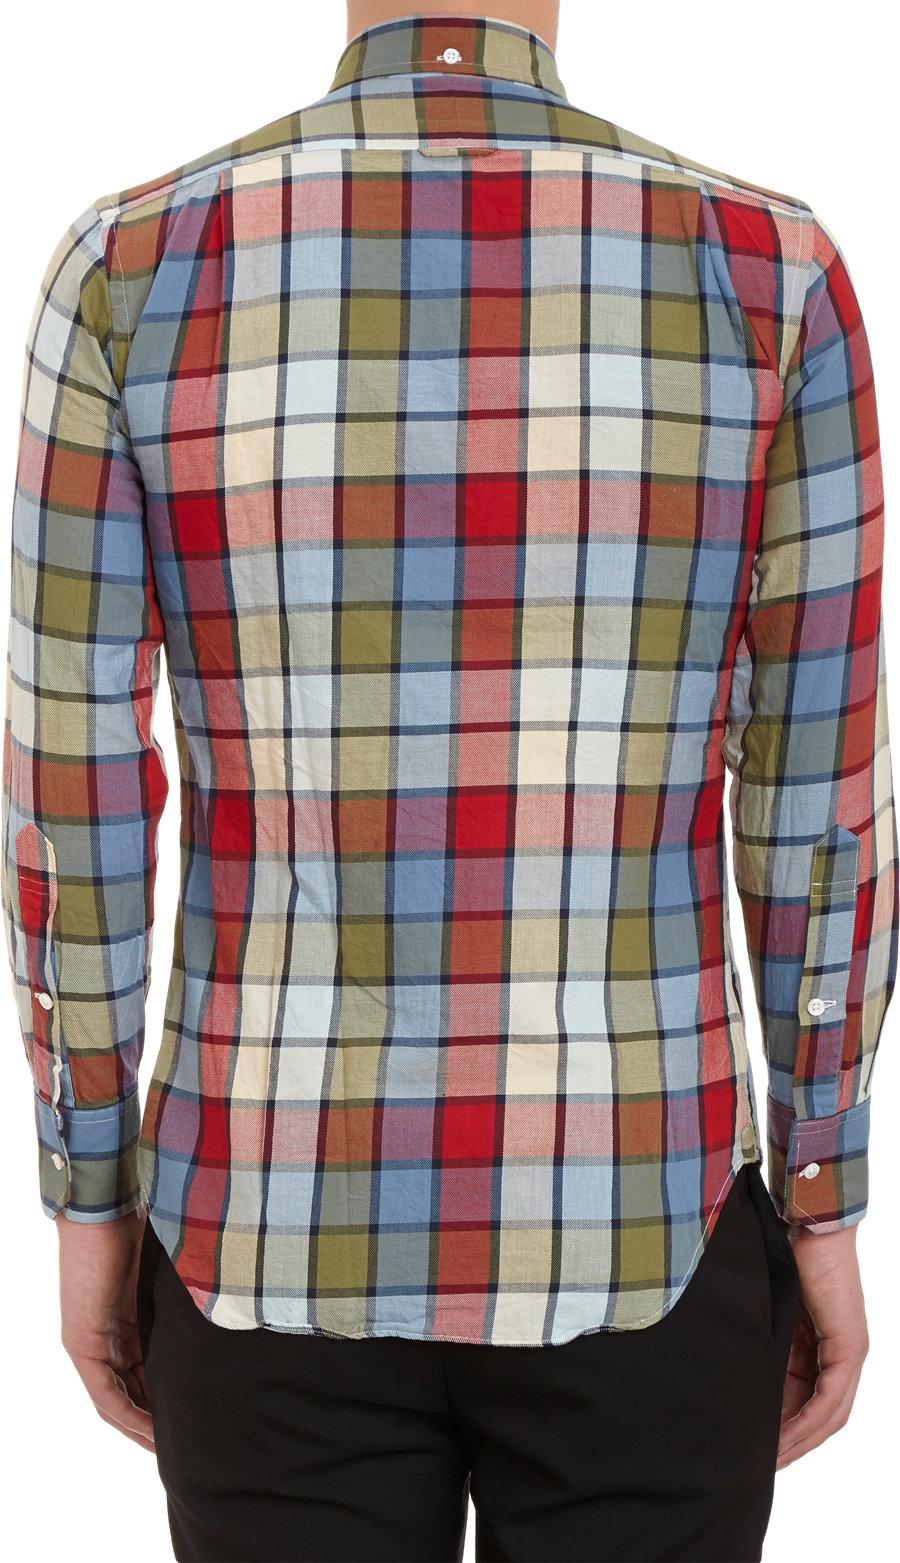 Lyst thom browne buffalo check flannel shirt in red for men for Buffalo check flannel shirt jacket